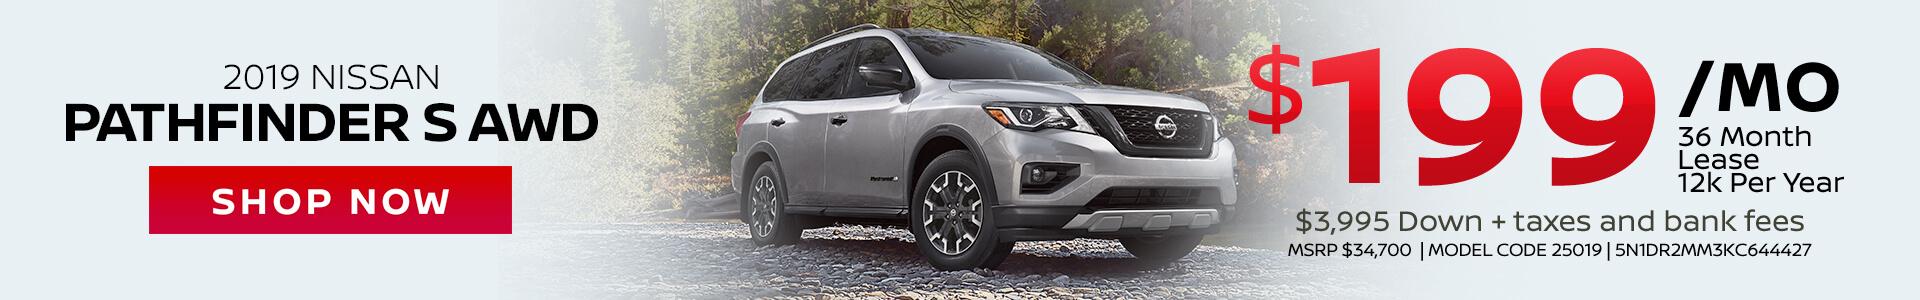 Nissan Pathfinder $199 Lease